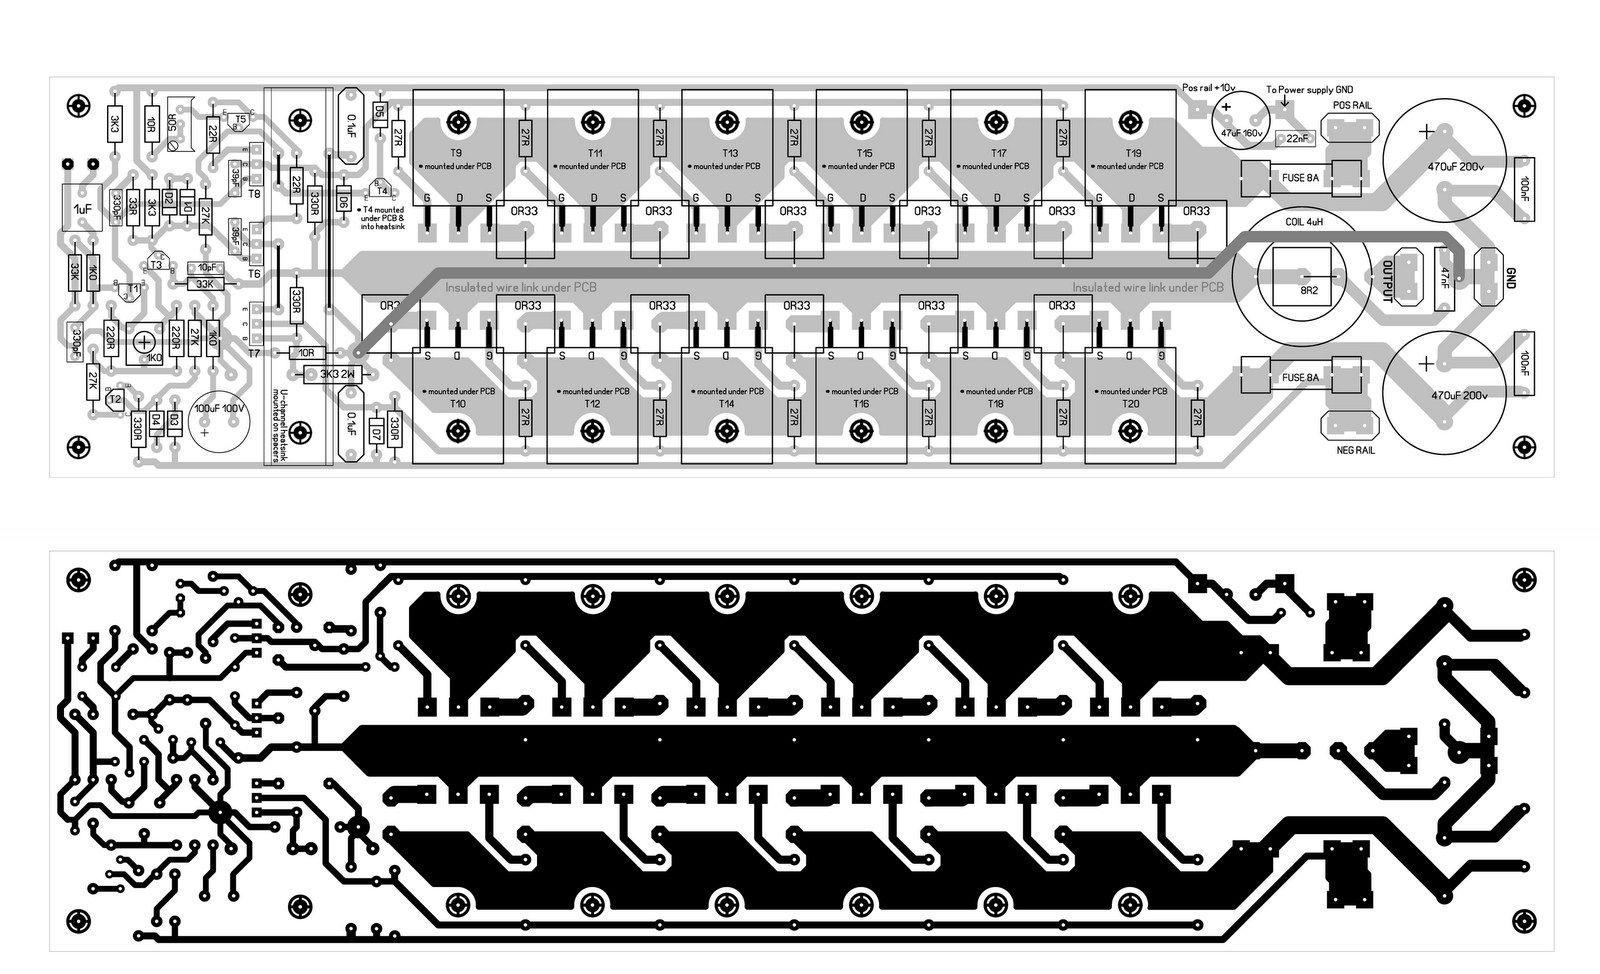 600w mosfet power amplifier pcb design [ 1600 x 974 Pixel ]